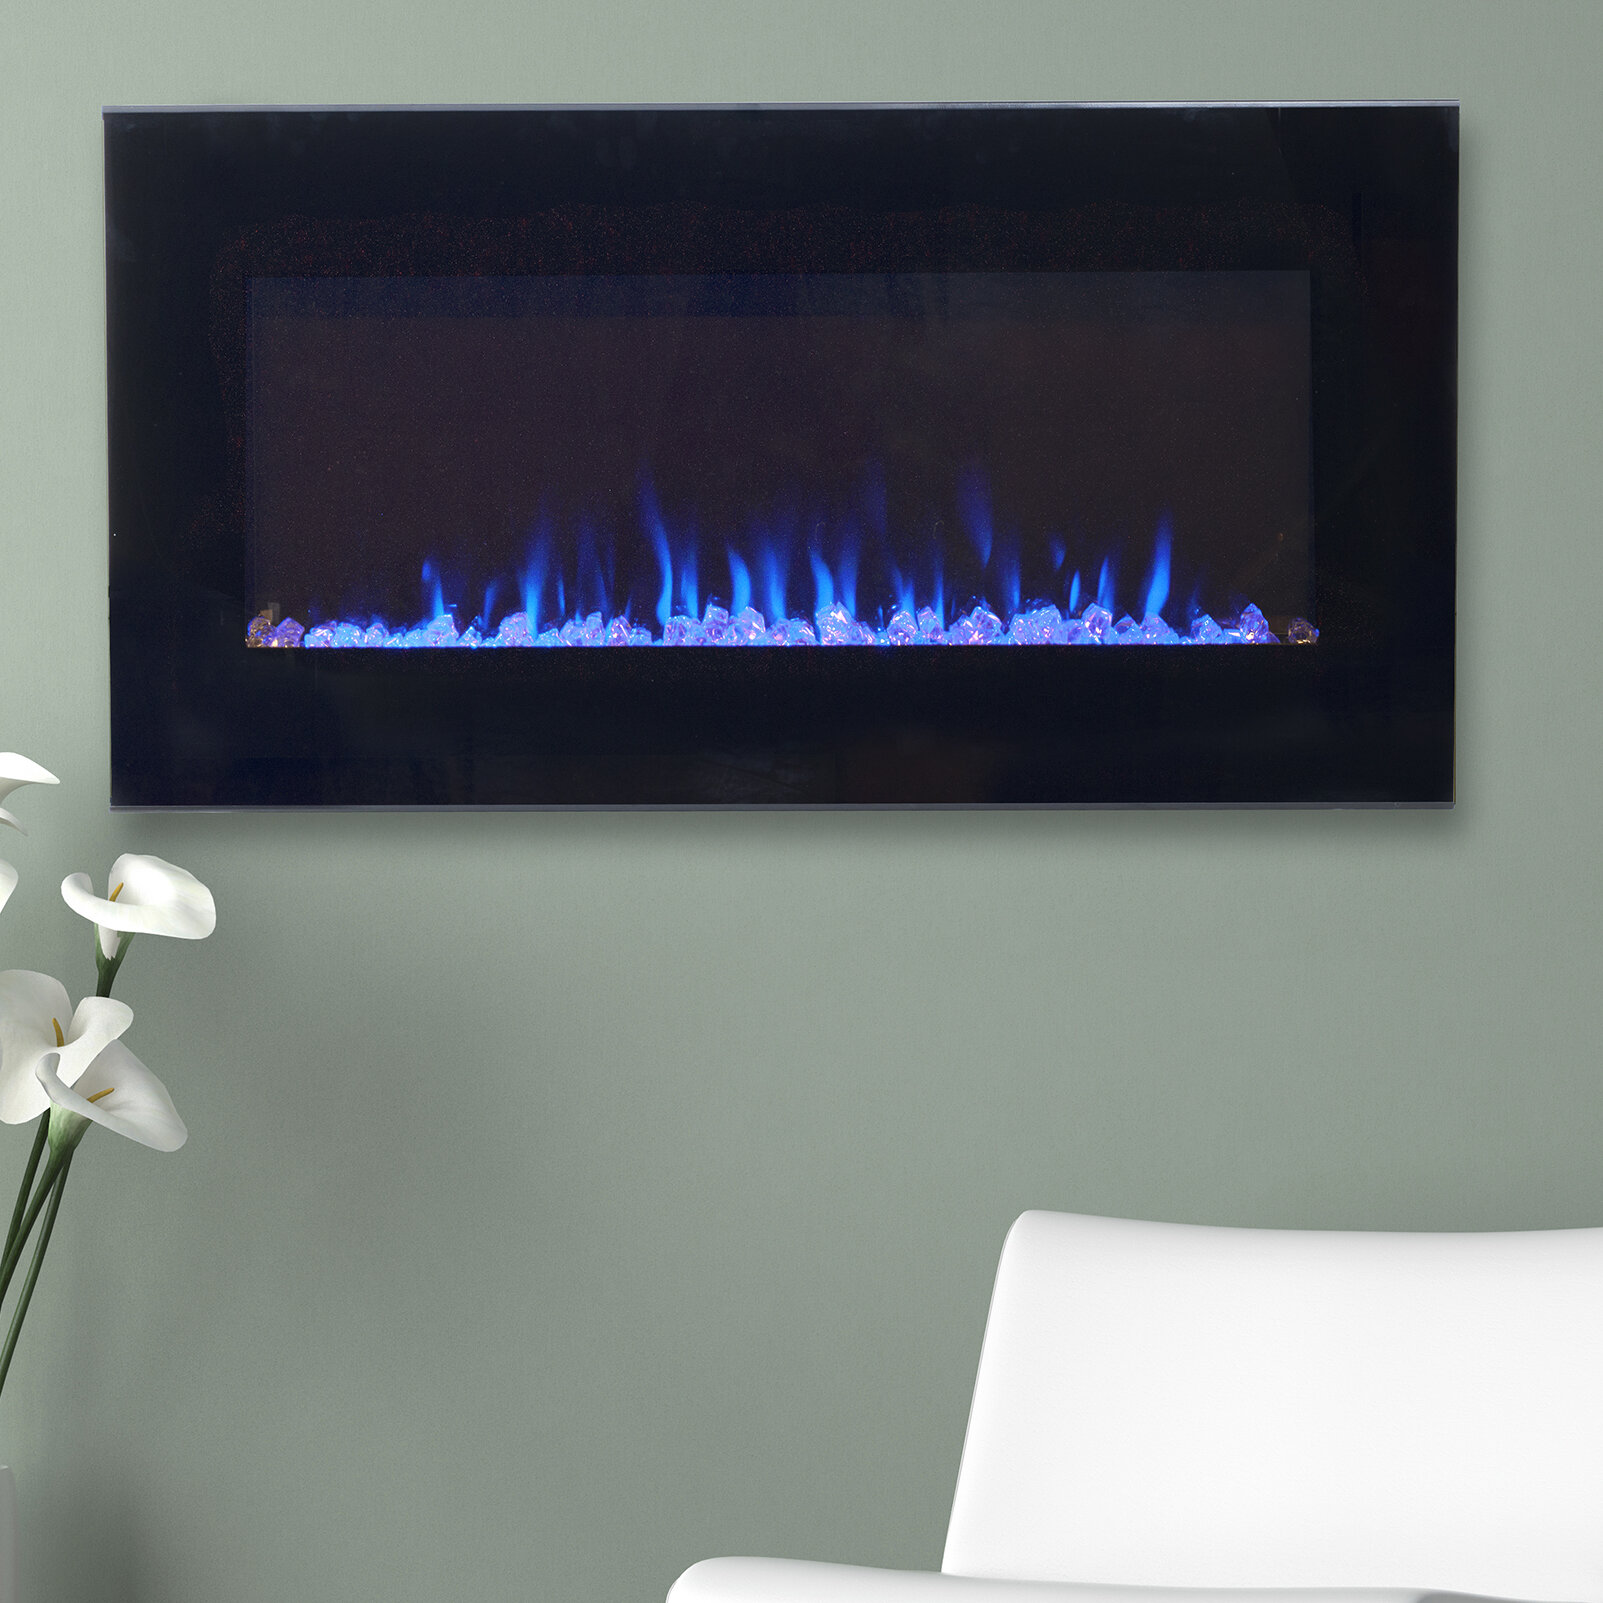 Incredible Amish Fireplace Wayfair Interior Design Ideas Gresisoteloinfo